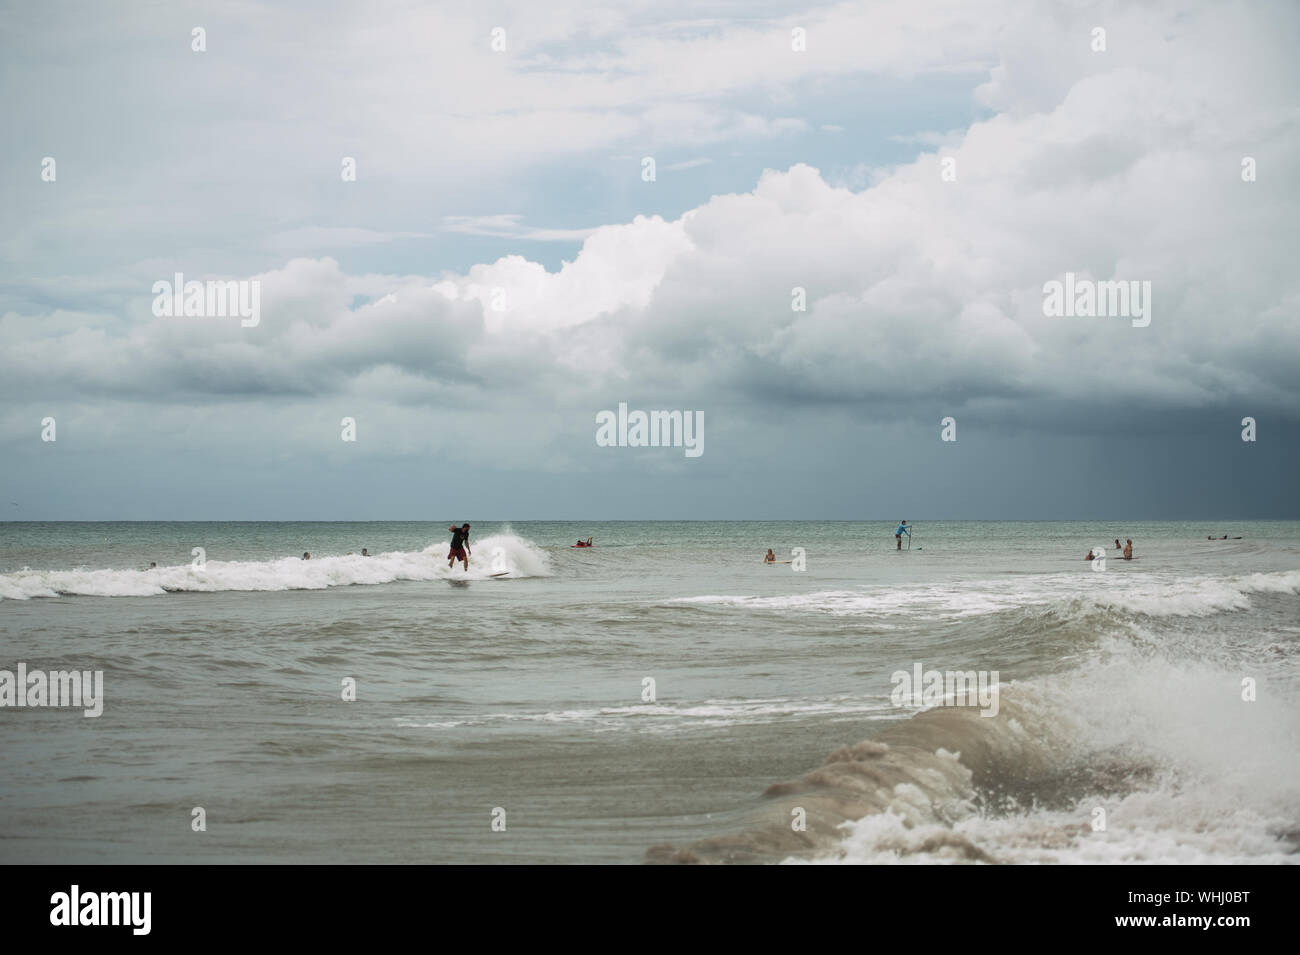 Dania Beach, Florida, USA. 2nd Sep, 2019. Surfers enjoy the waves at Dania Beach, FL, as wind picks up with Hurricane Dorian approaching the coast of Florida. Credit: Orit Ben-Ezzer/ZUMA Wire/Alamy Live News Stock Photo